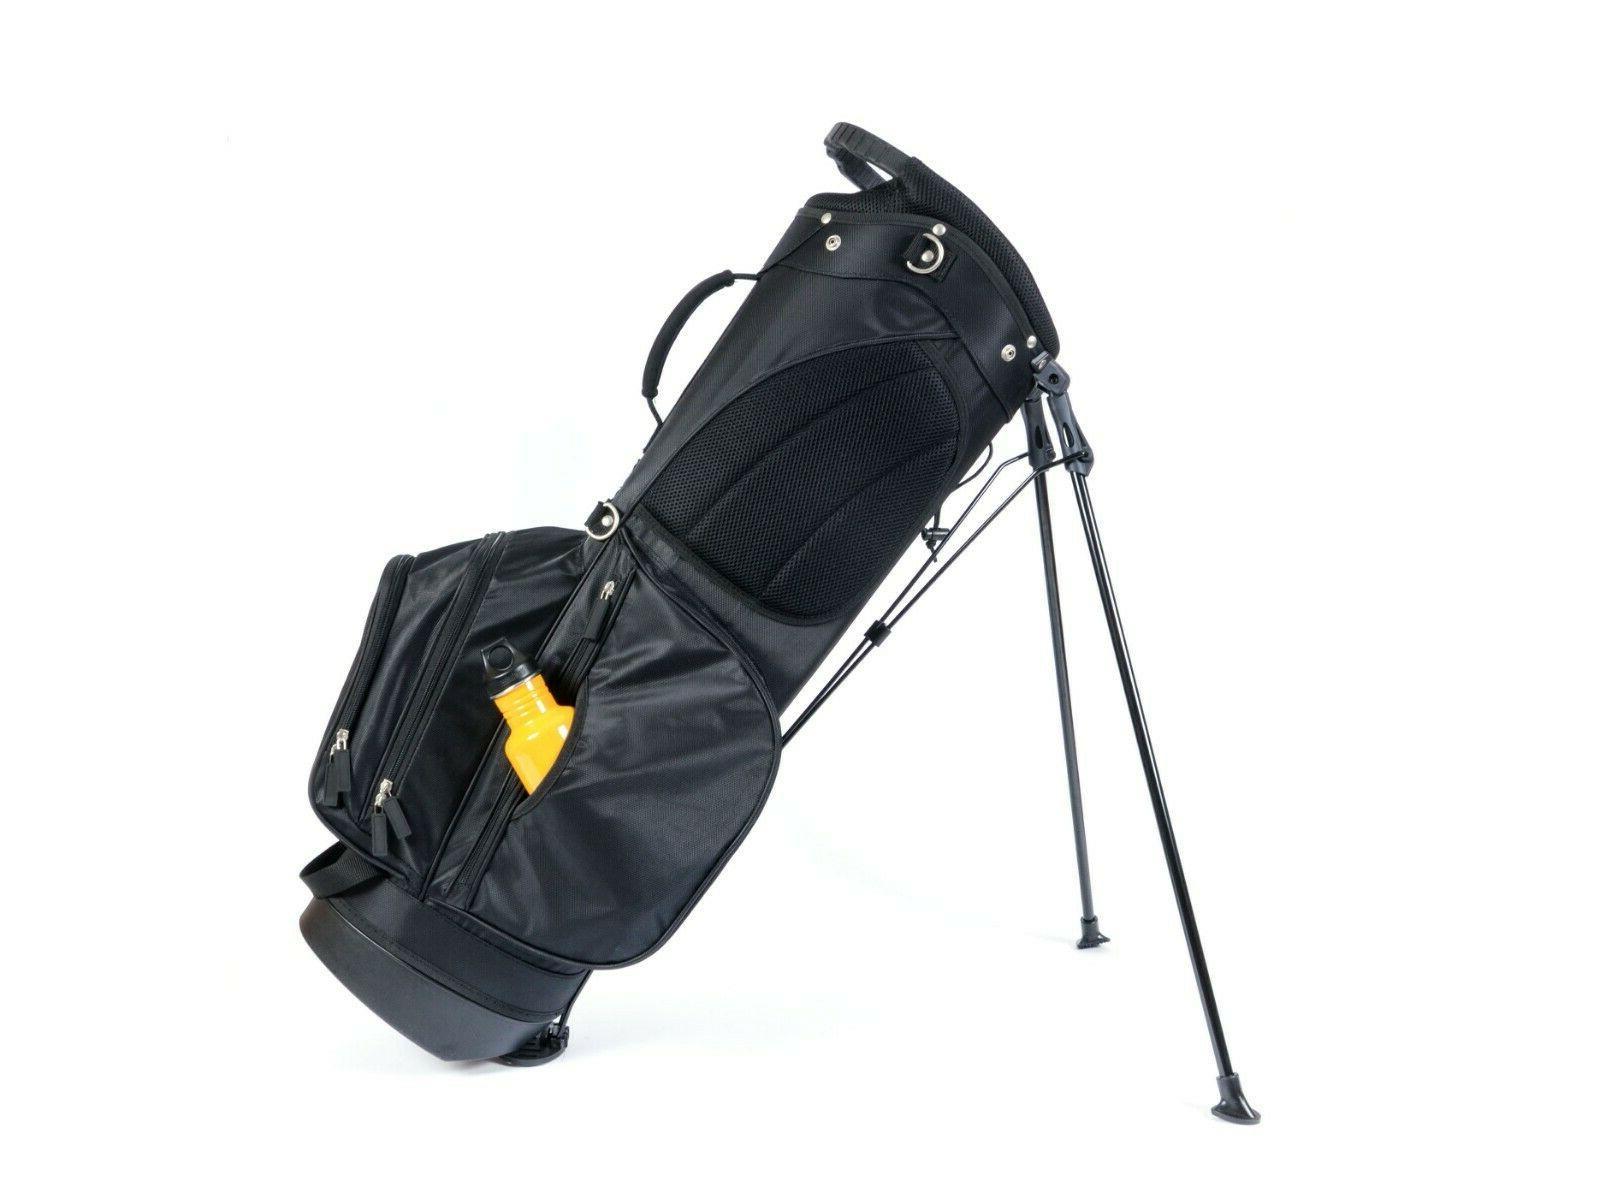 Black Lightweight Bag